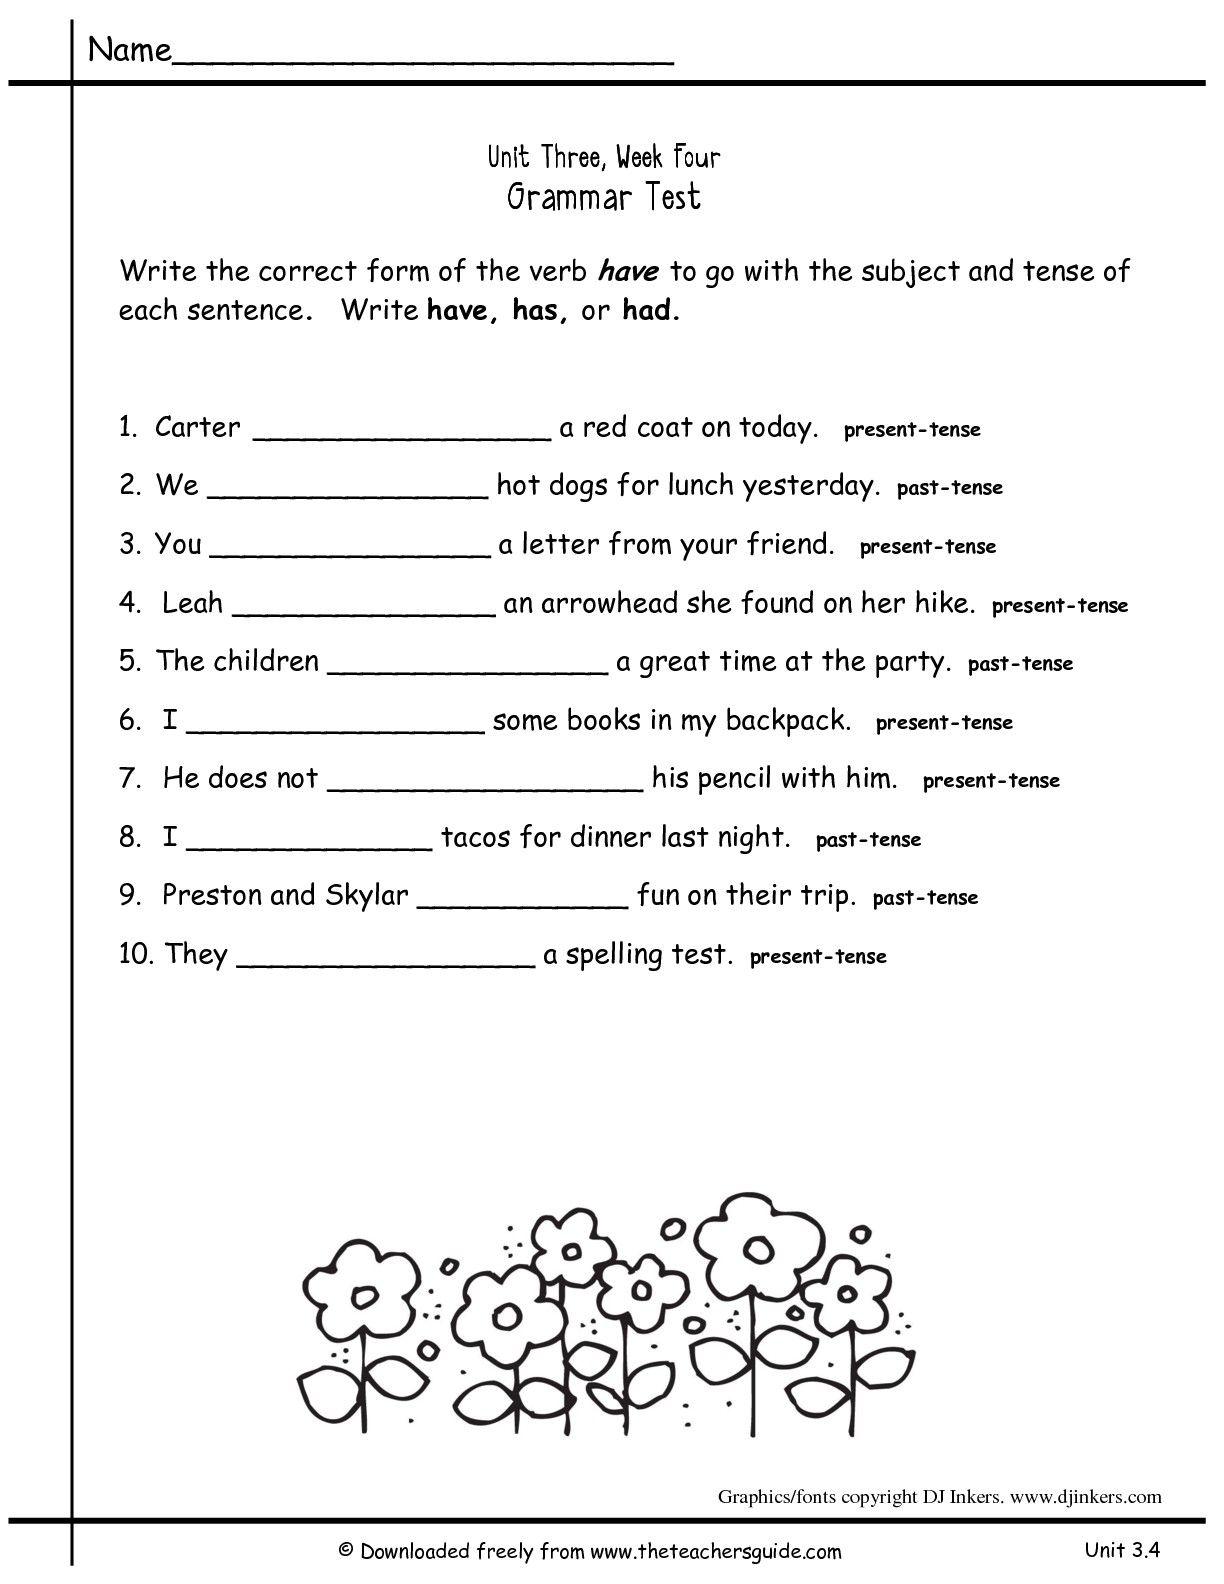 Noun Verb Agreement Worksheet   Printable Worksheets and Activities for  Teachers [ 1584 x 1224 Pixel ]